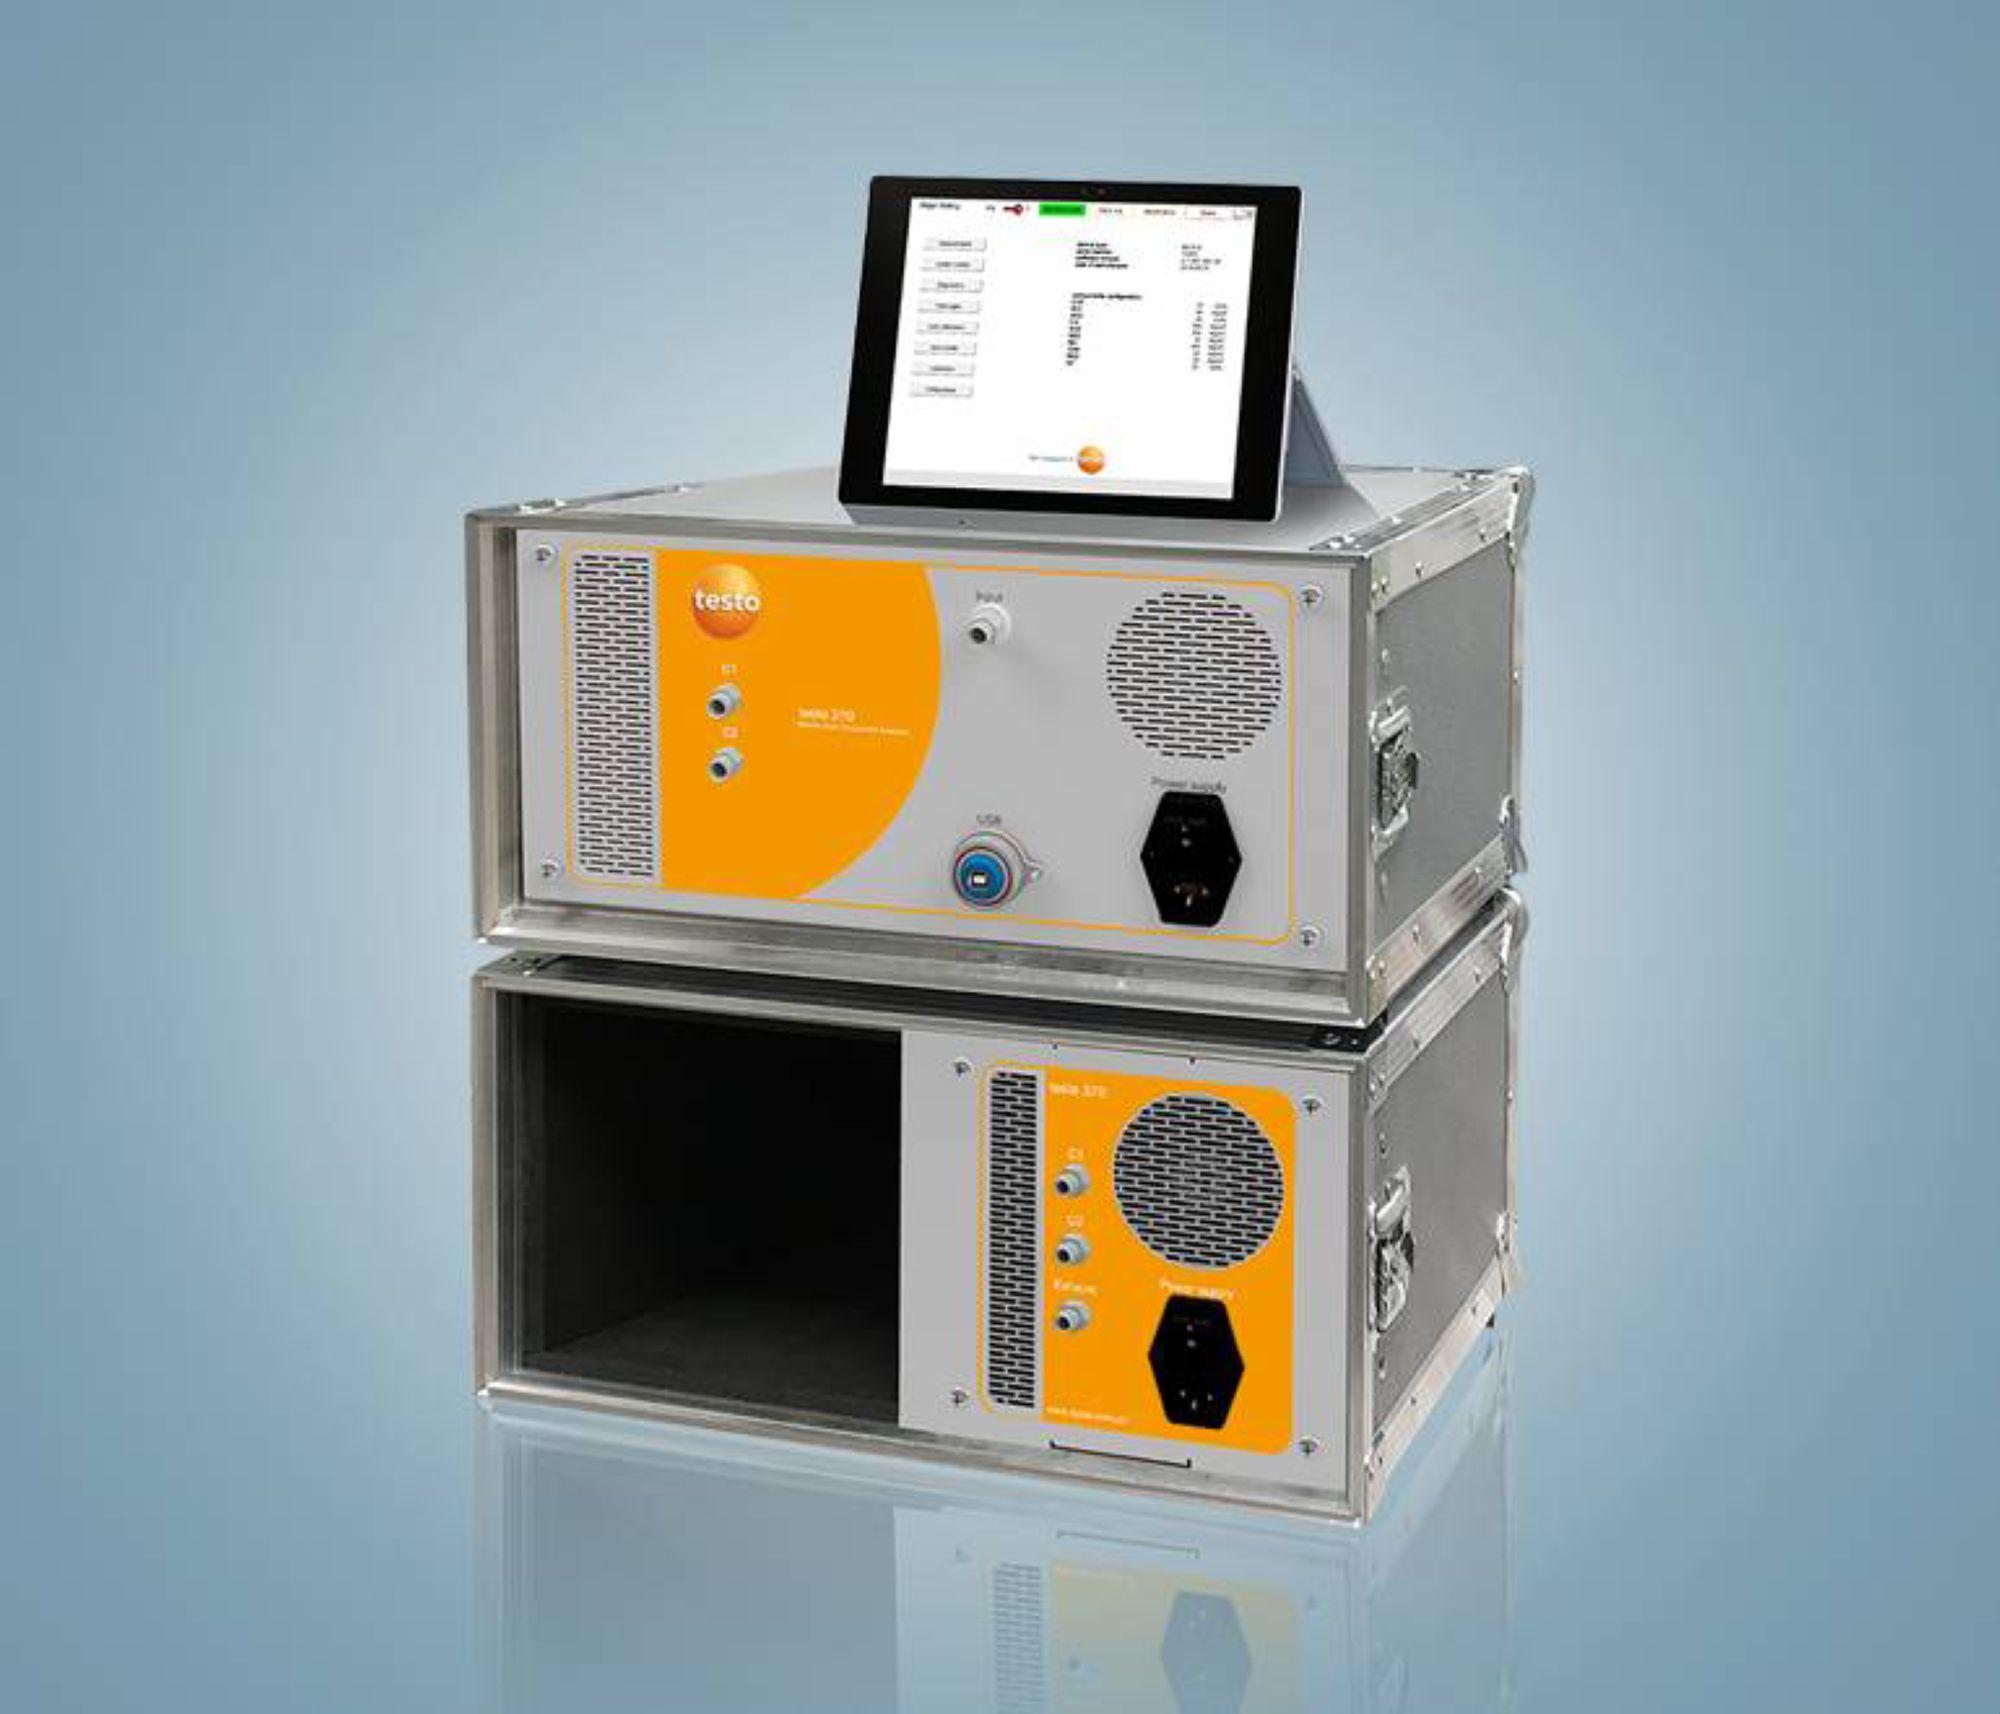 testo 370 高精度红外烟气分析仪